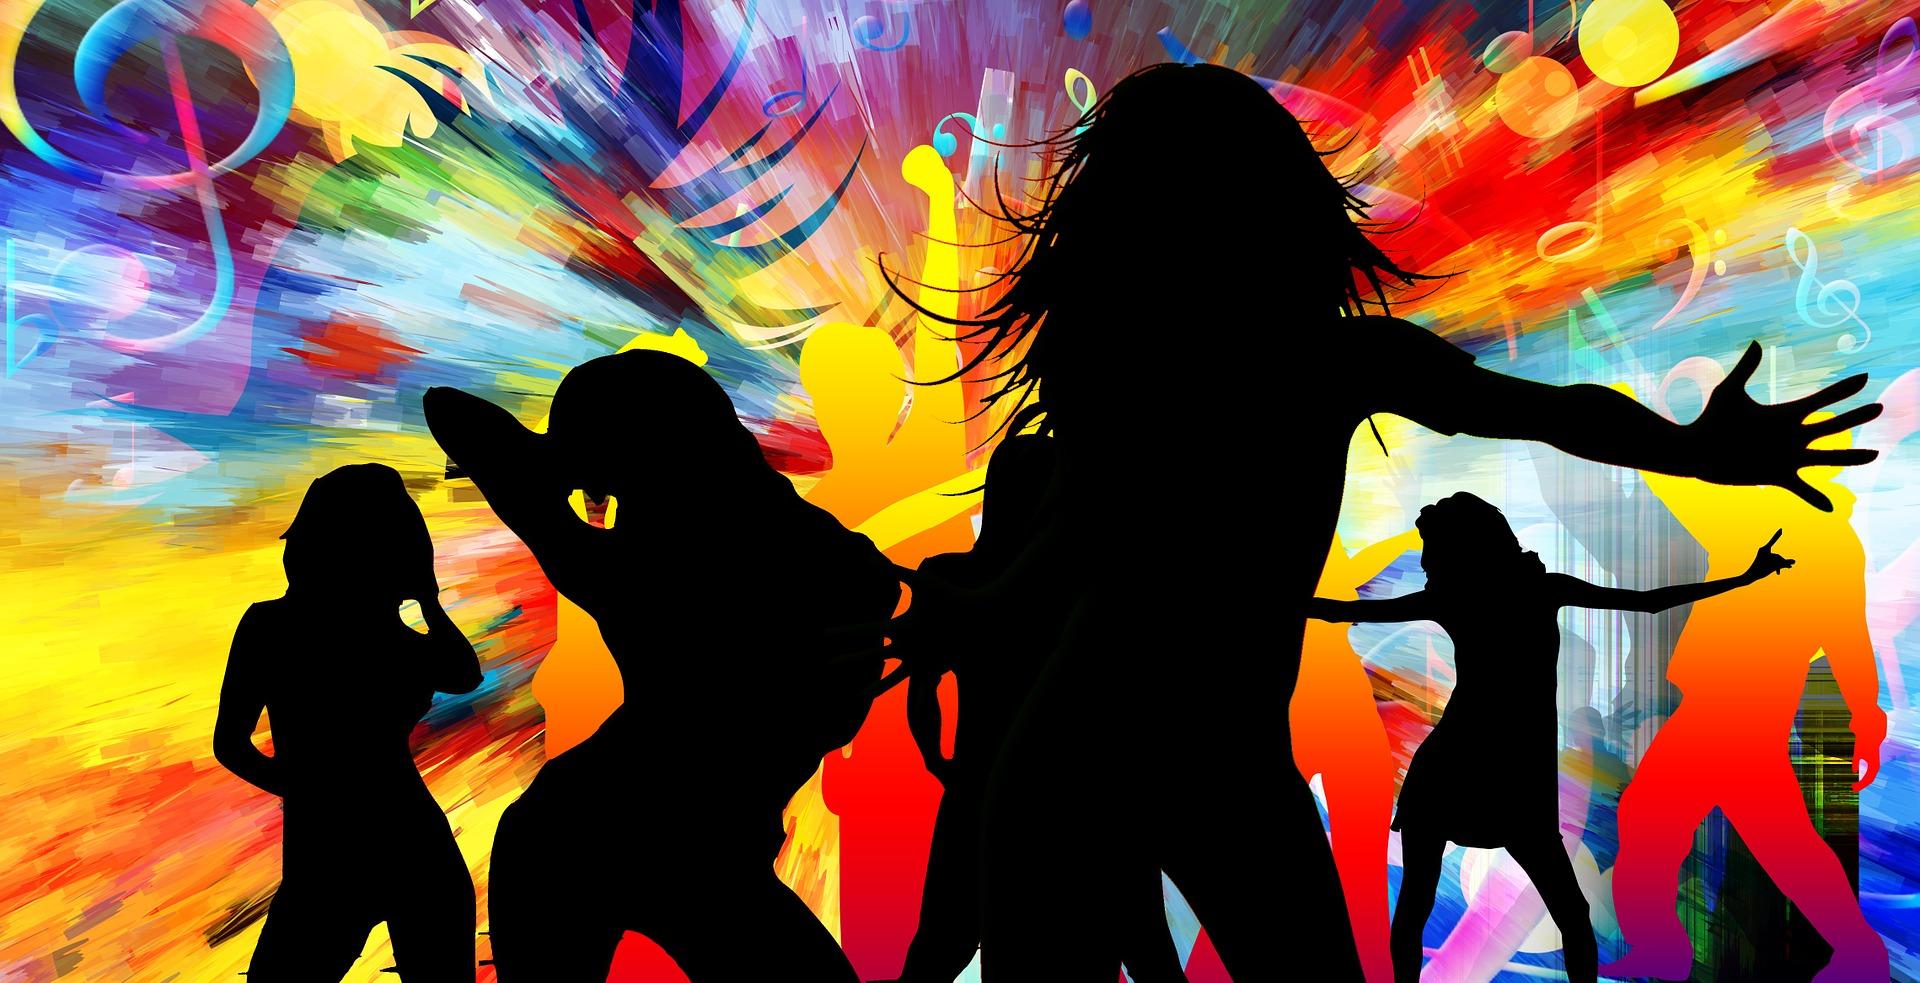 baile, ダンス, ディスク, パーティー, リズム, 女性, 違います。, 色 - HD の壁紙 - 教授-falken.com